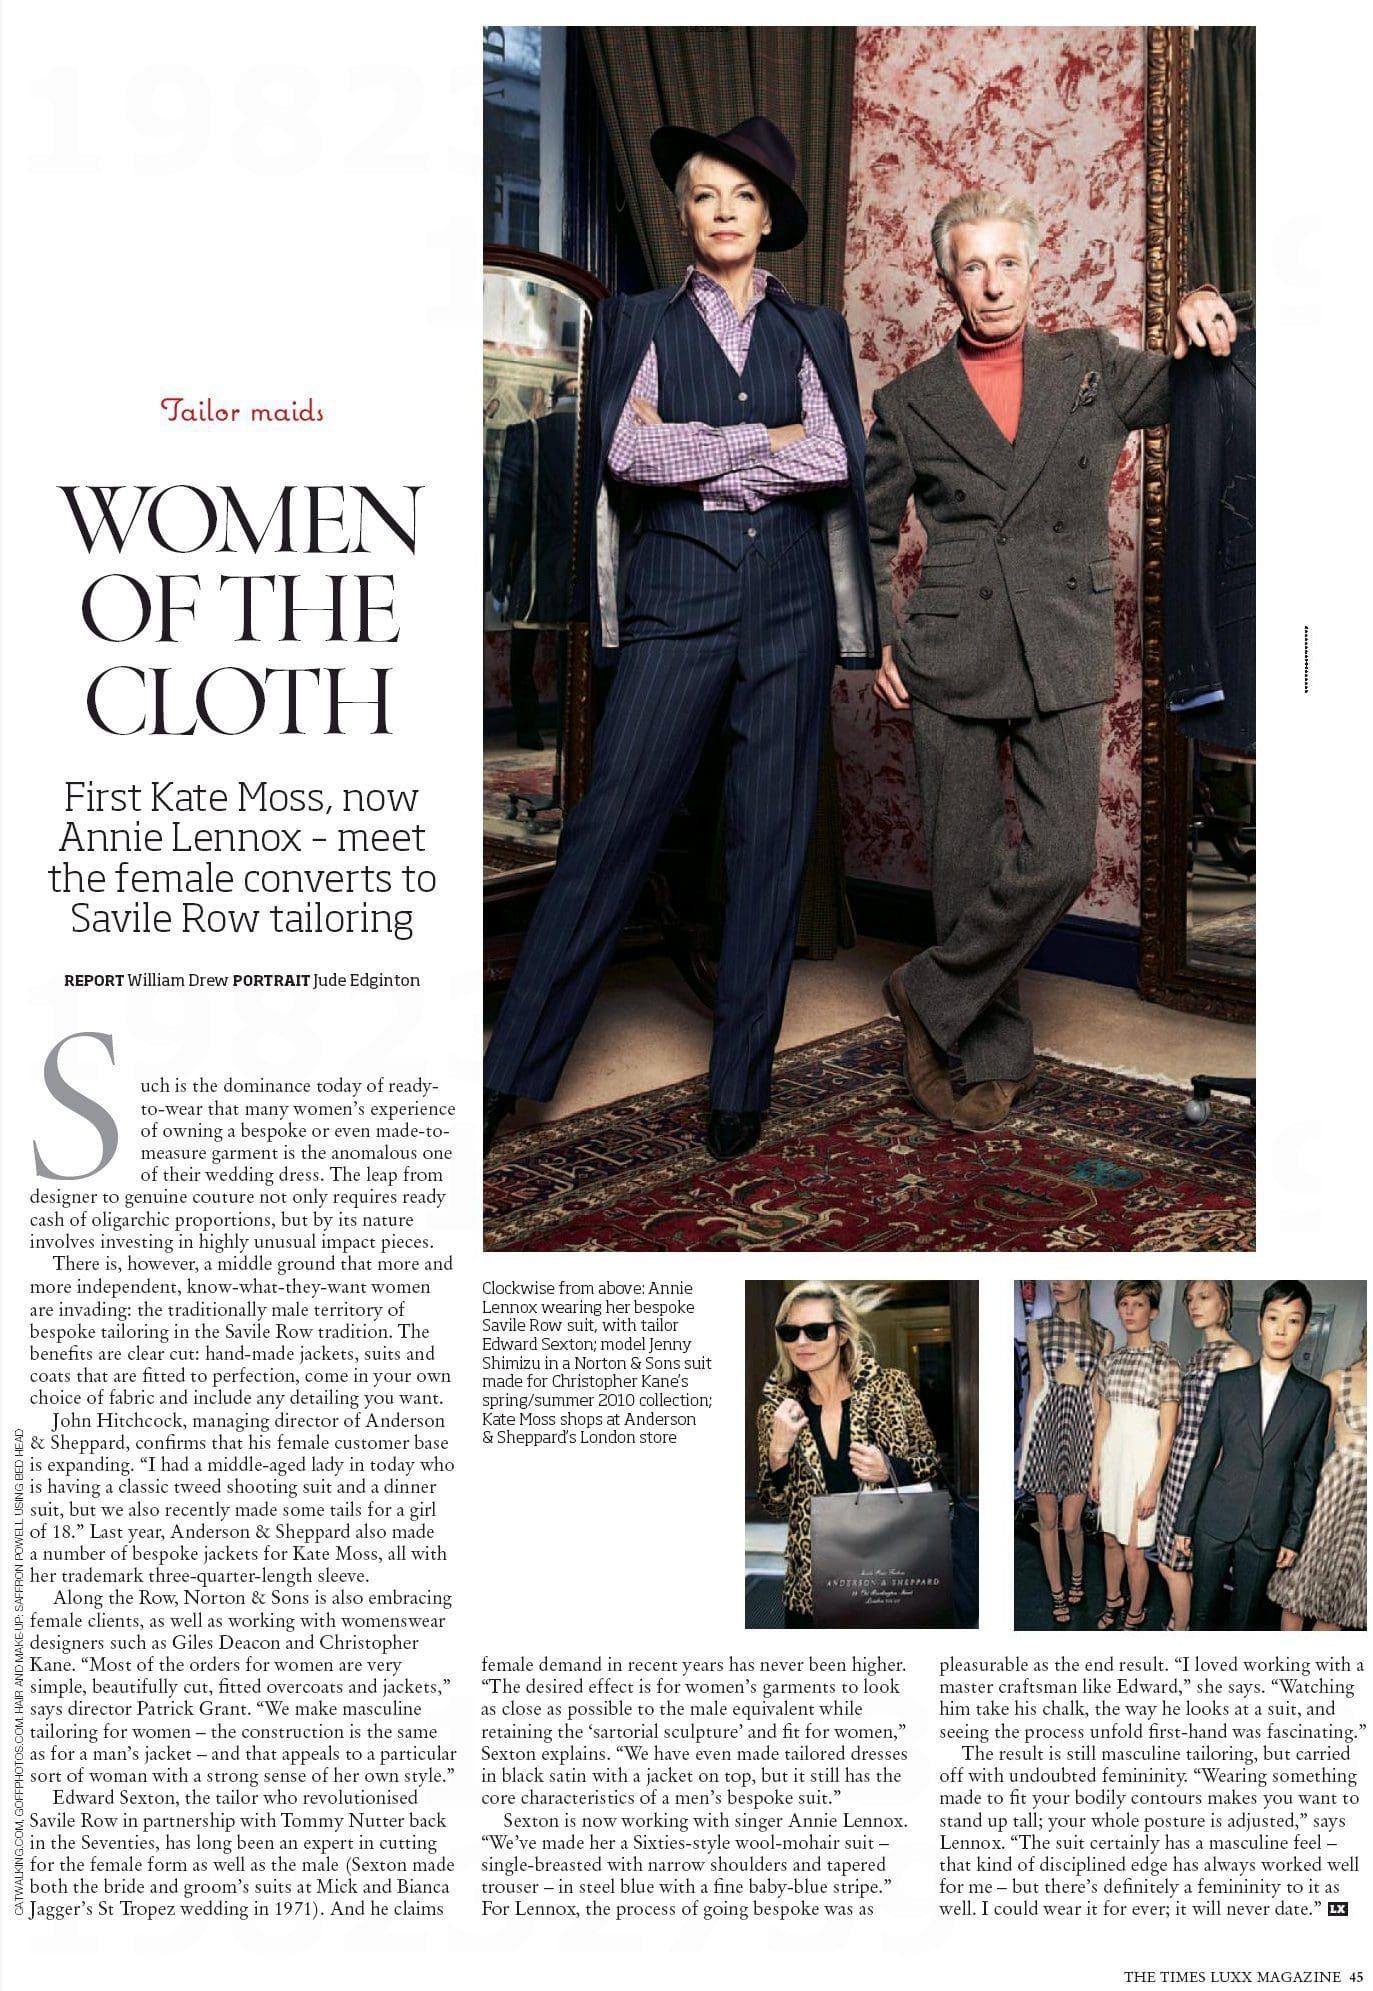 Edward Sexton and Annie Lennox in the Times Luxx Magazine